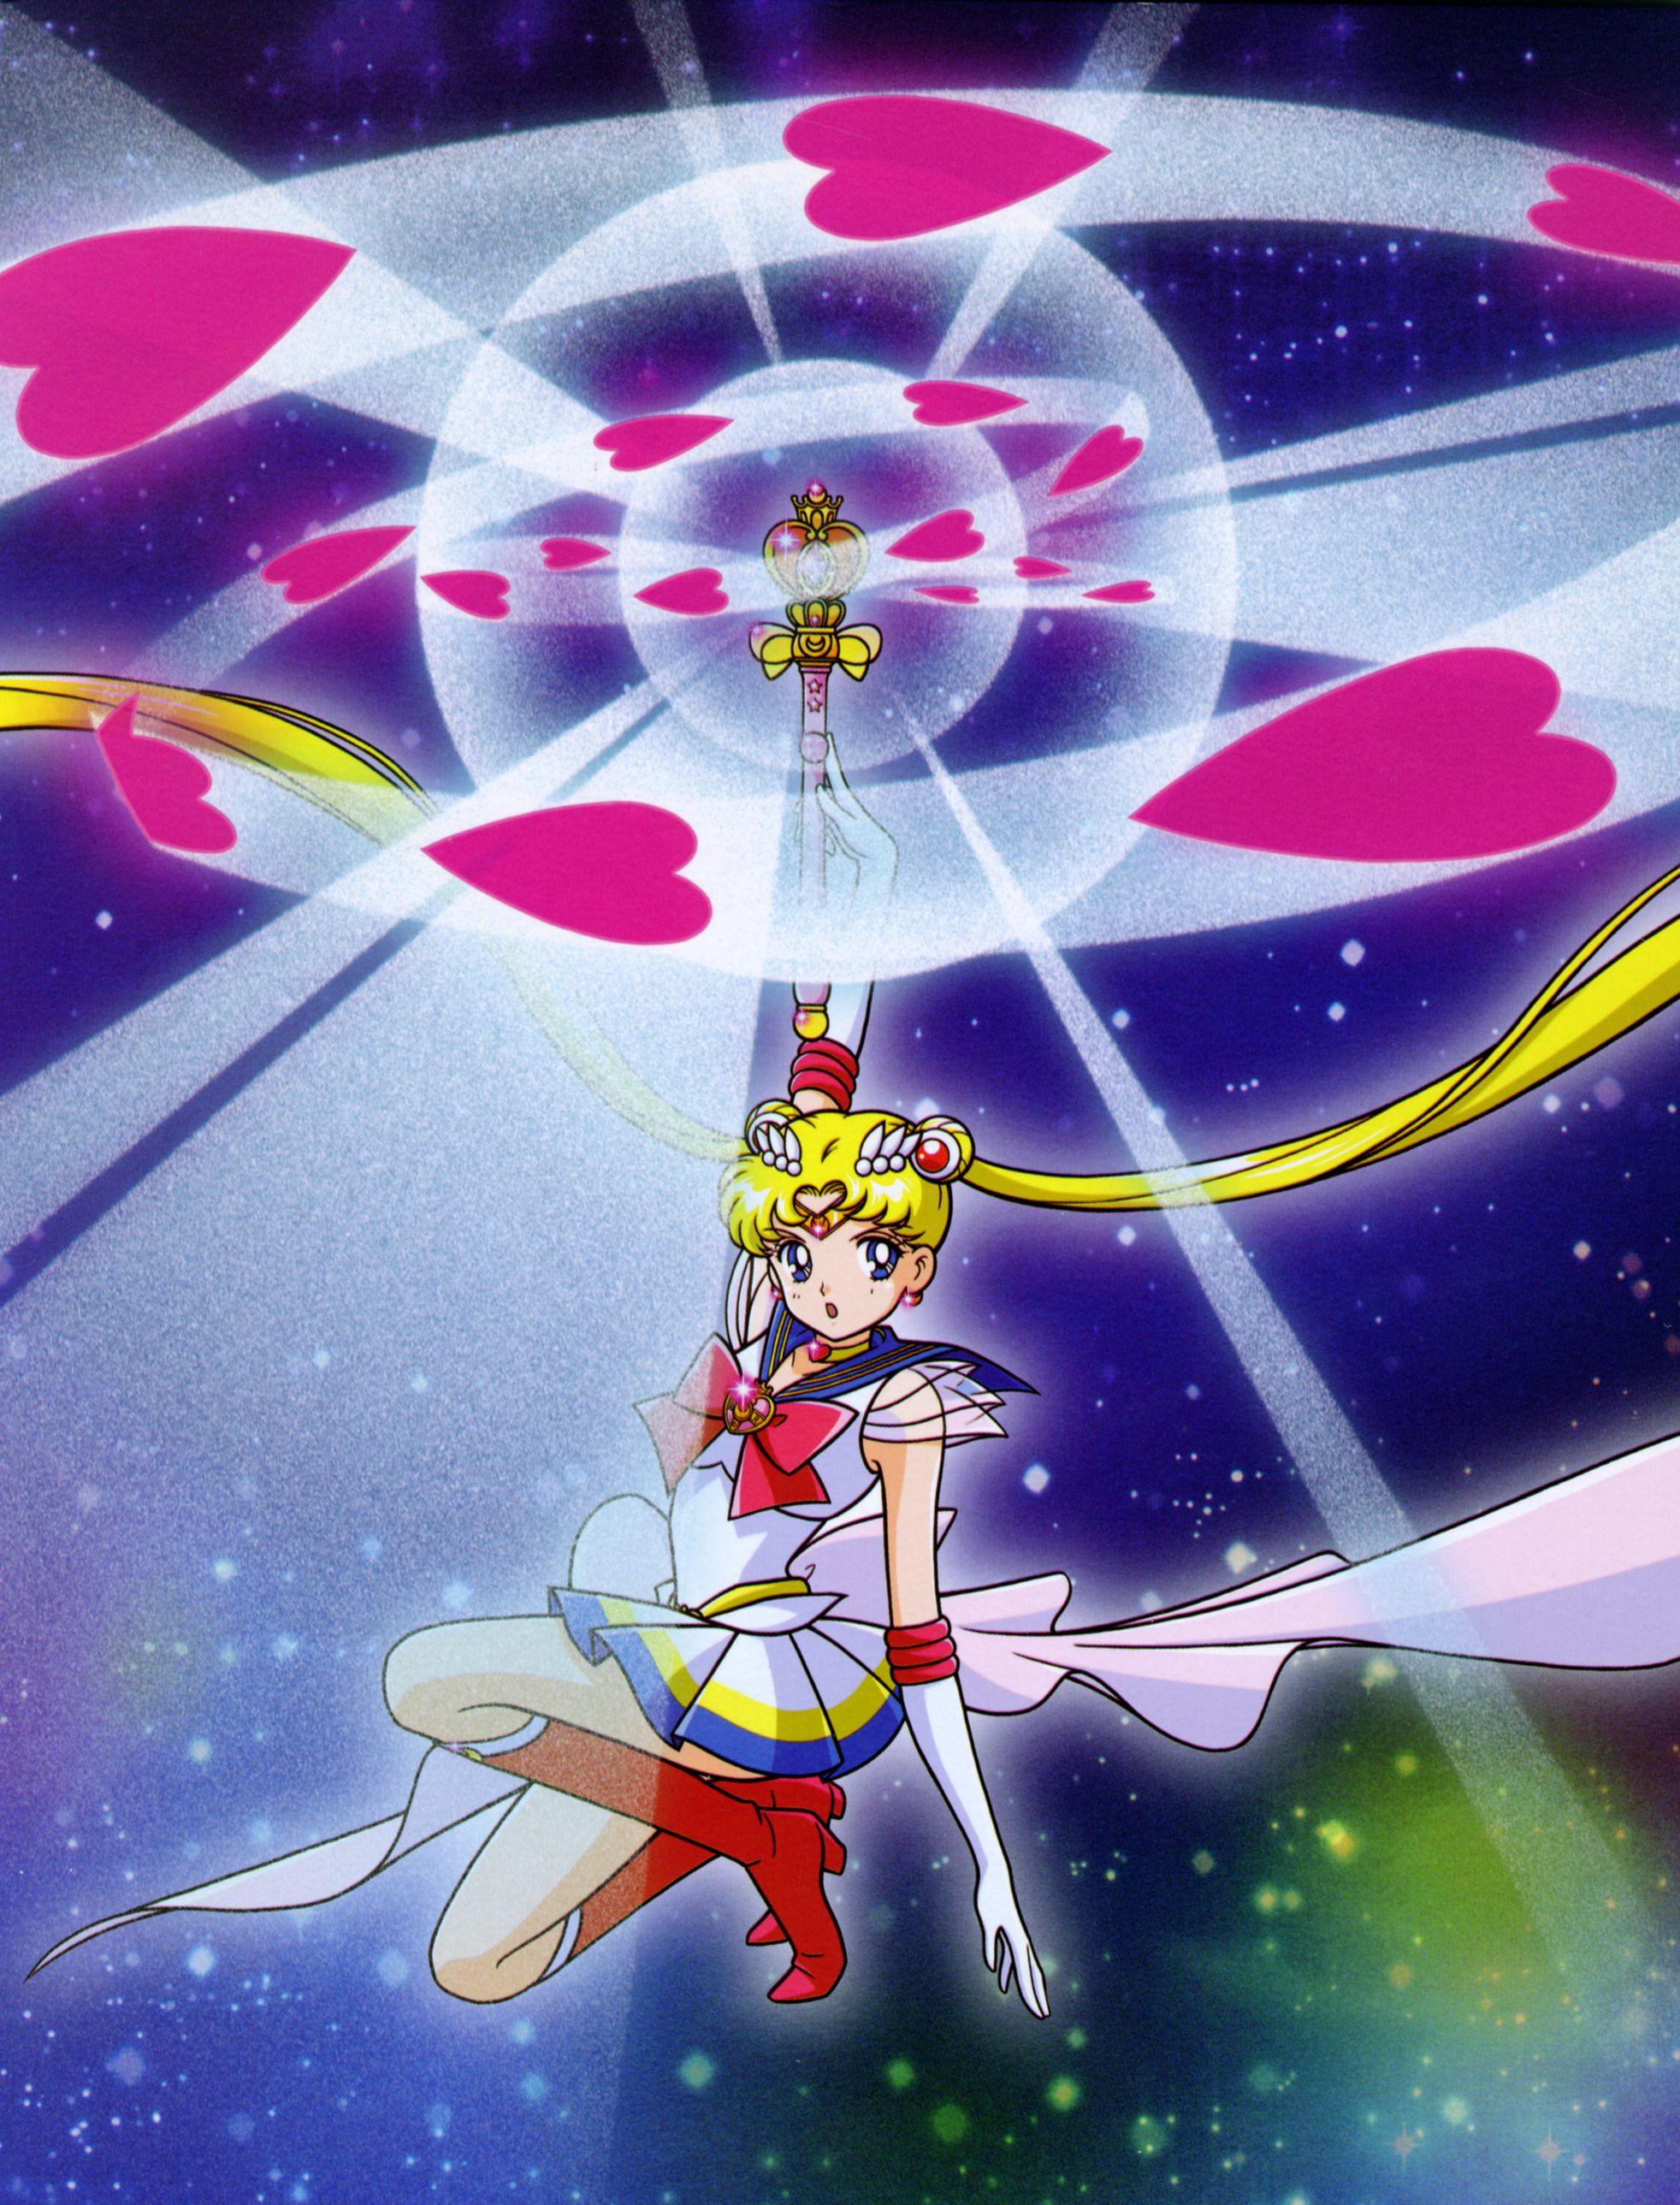 Tags Bishoujo Senshi Sailor Moon Tsukino Usagi Scan Sailor Moon Character Official Fondo De Pantalla De Sailor Moon Sailor Moon Imagenes De Sailor Moon